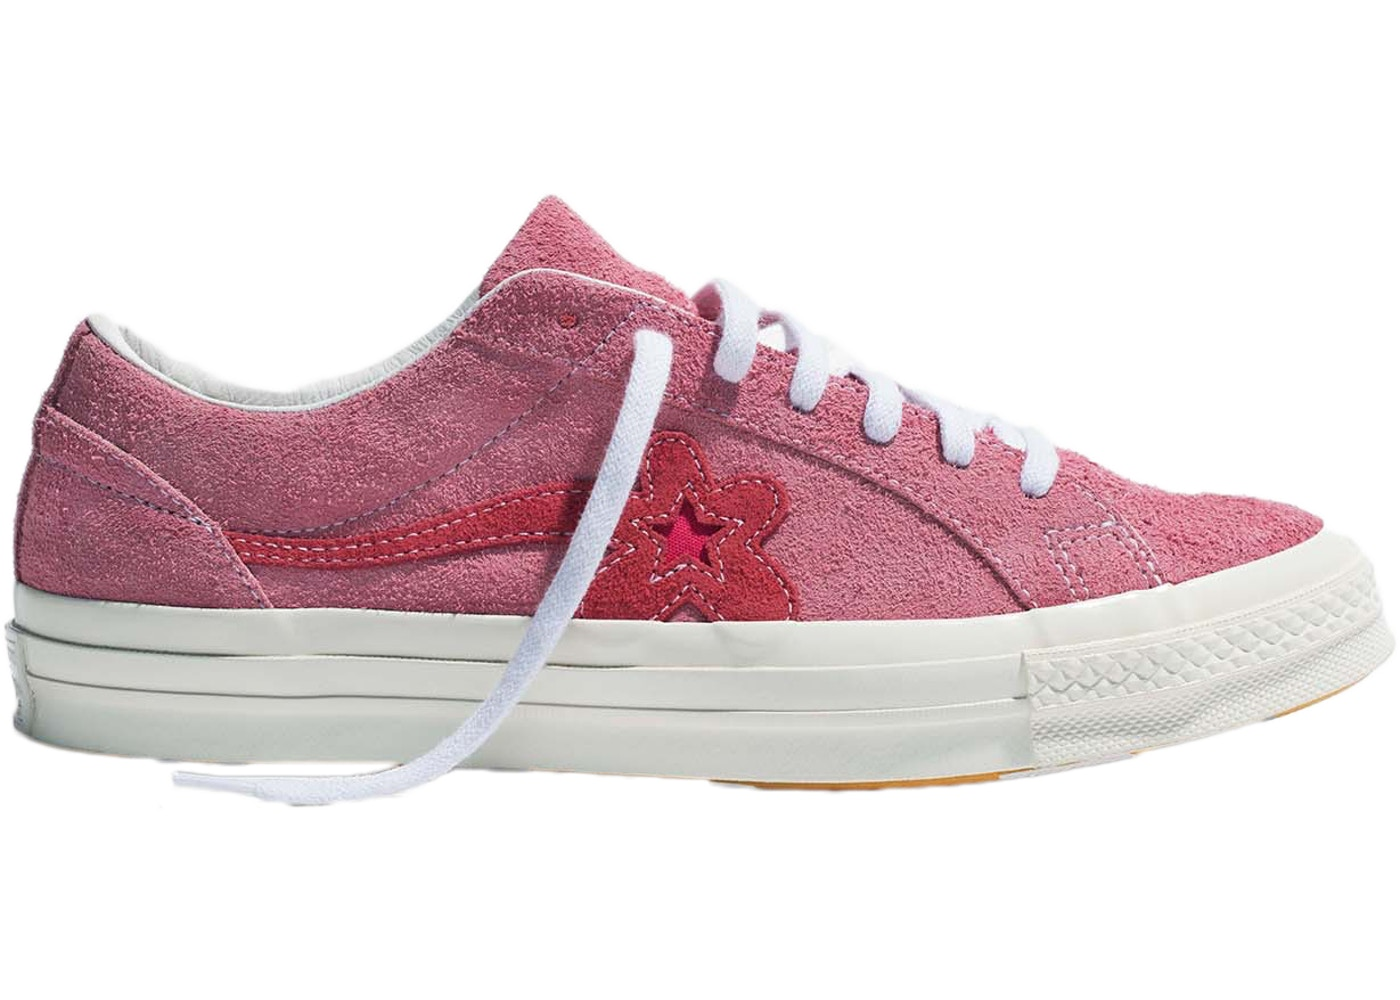 29830e996d6 Converse One Star Ox Tyler the Creator Golf Le Fleur Geranium Pink - 160325C